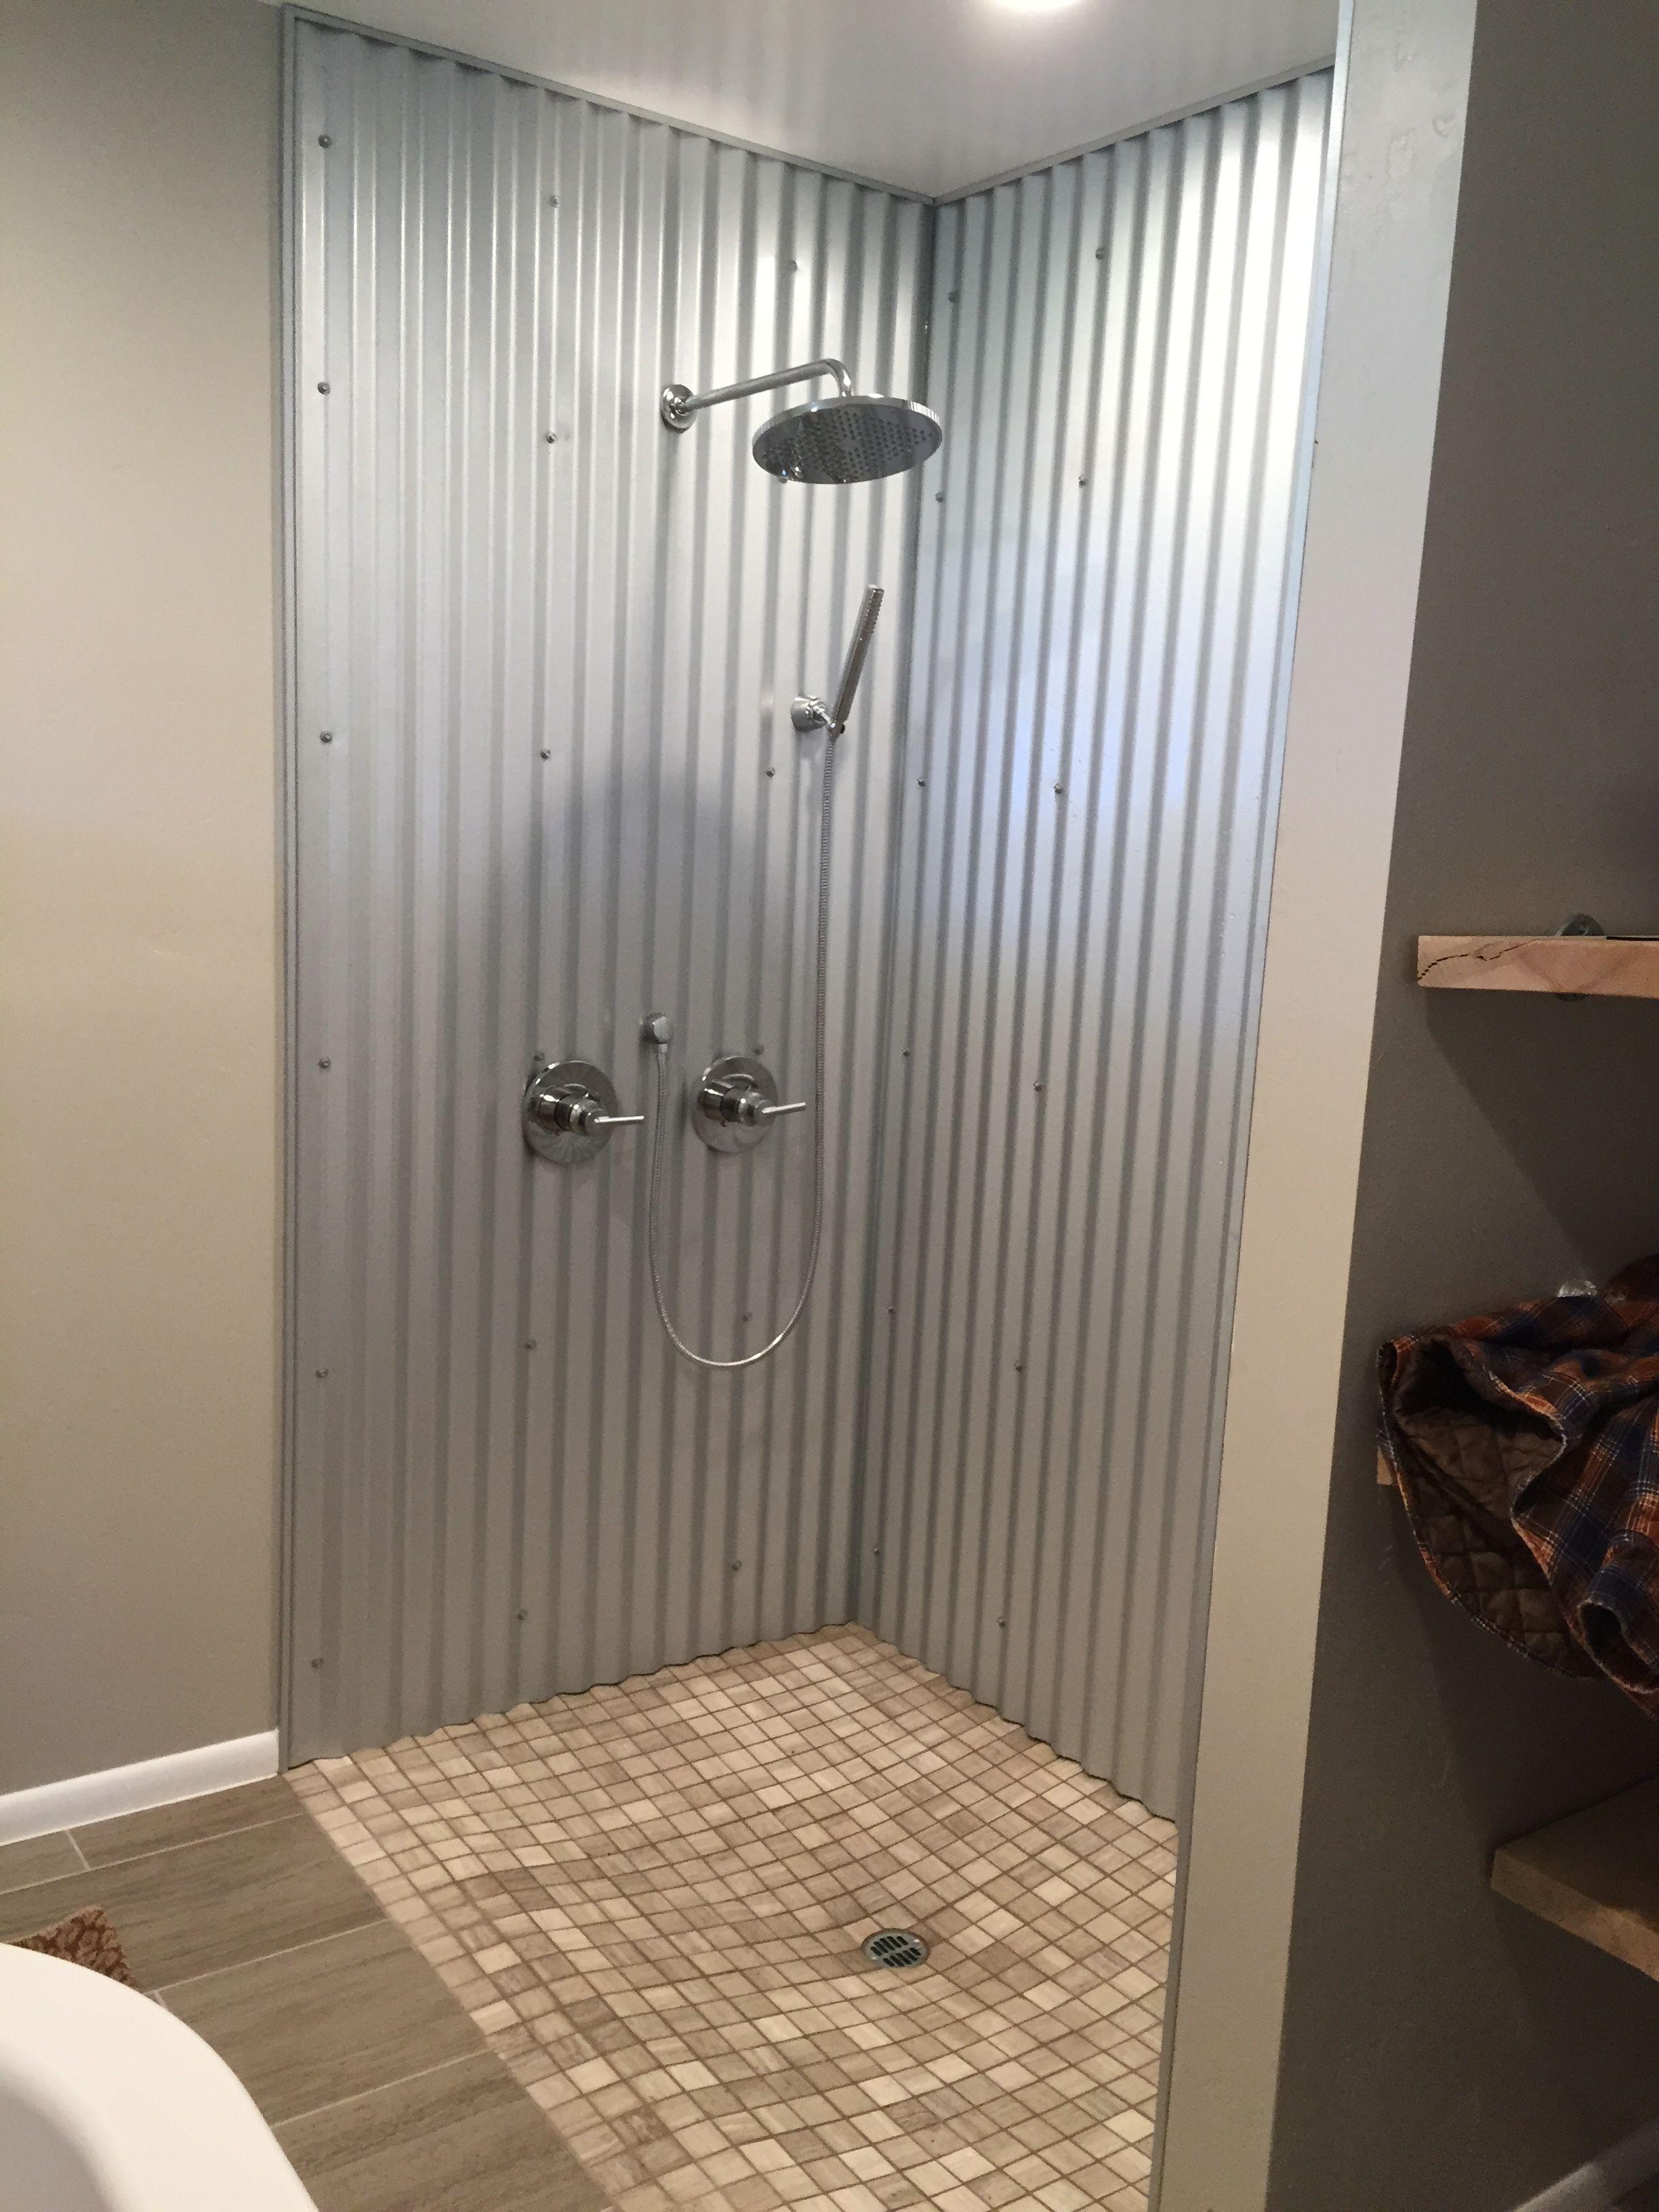 Shower Tin Shower Walls Shower Stall Rustic Bathrooms